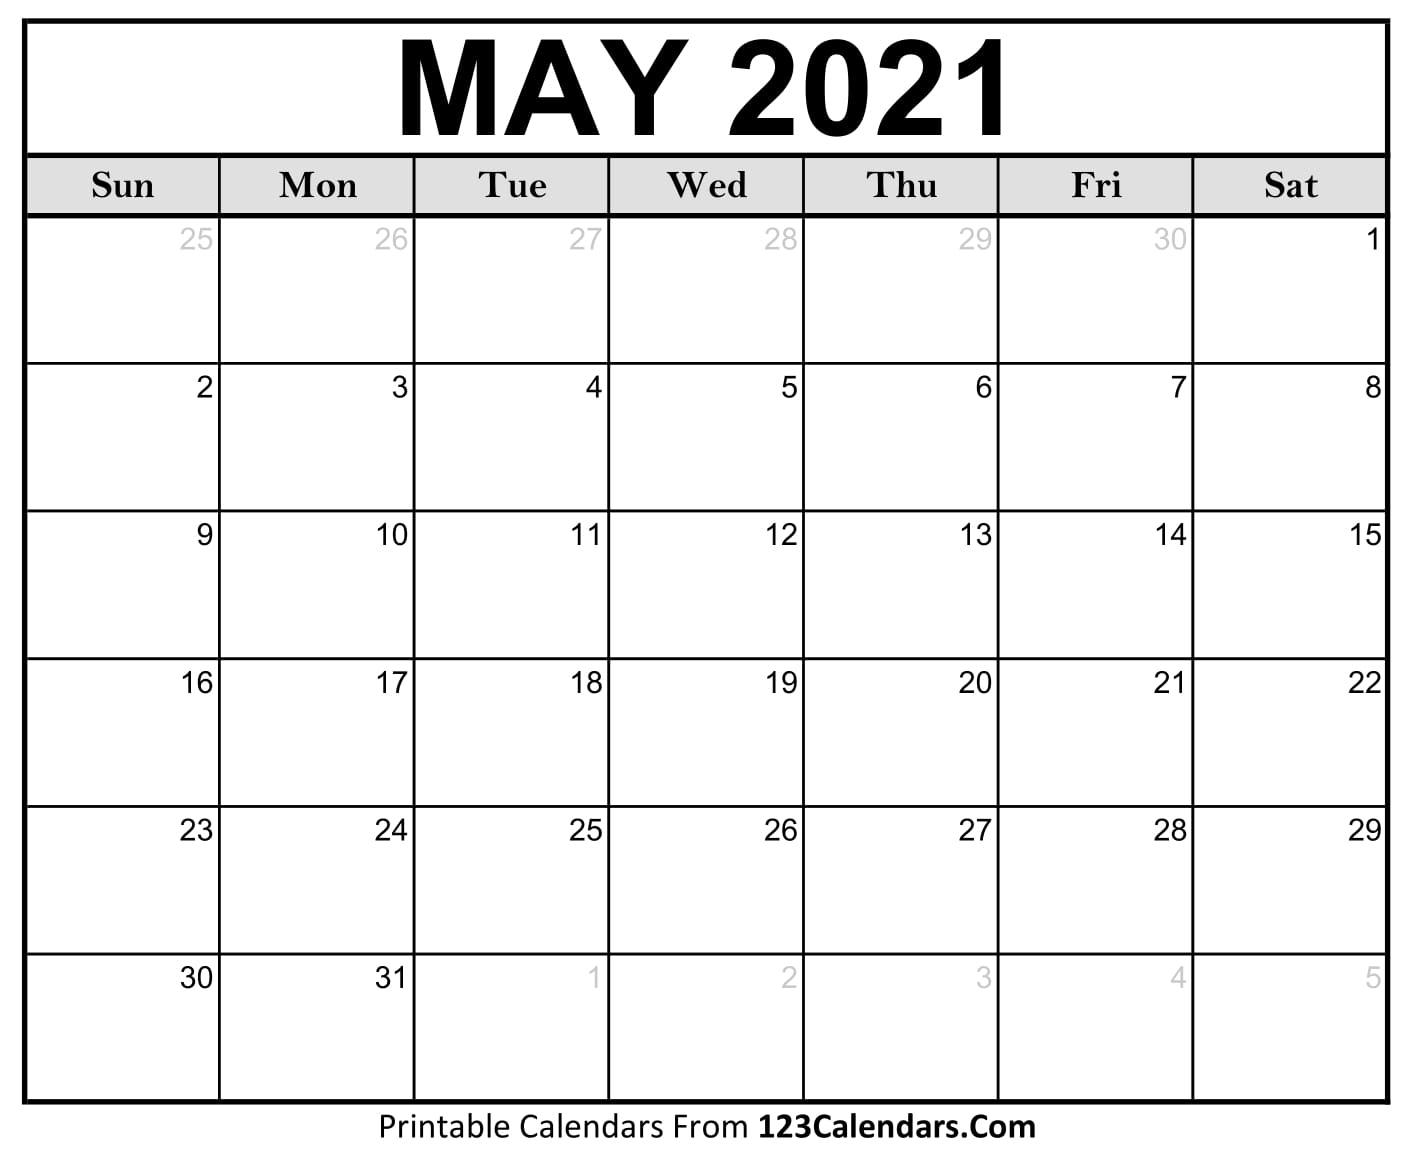 Printable May 2021 Calendar Templates | 123Calendars